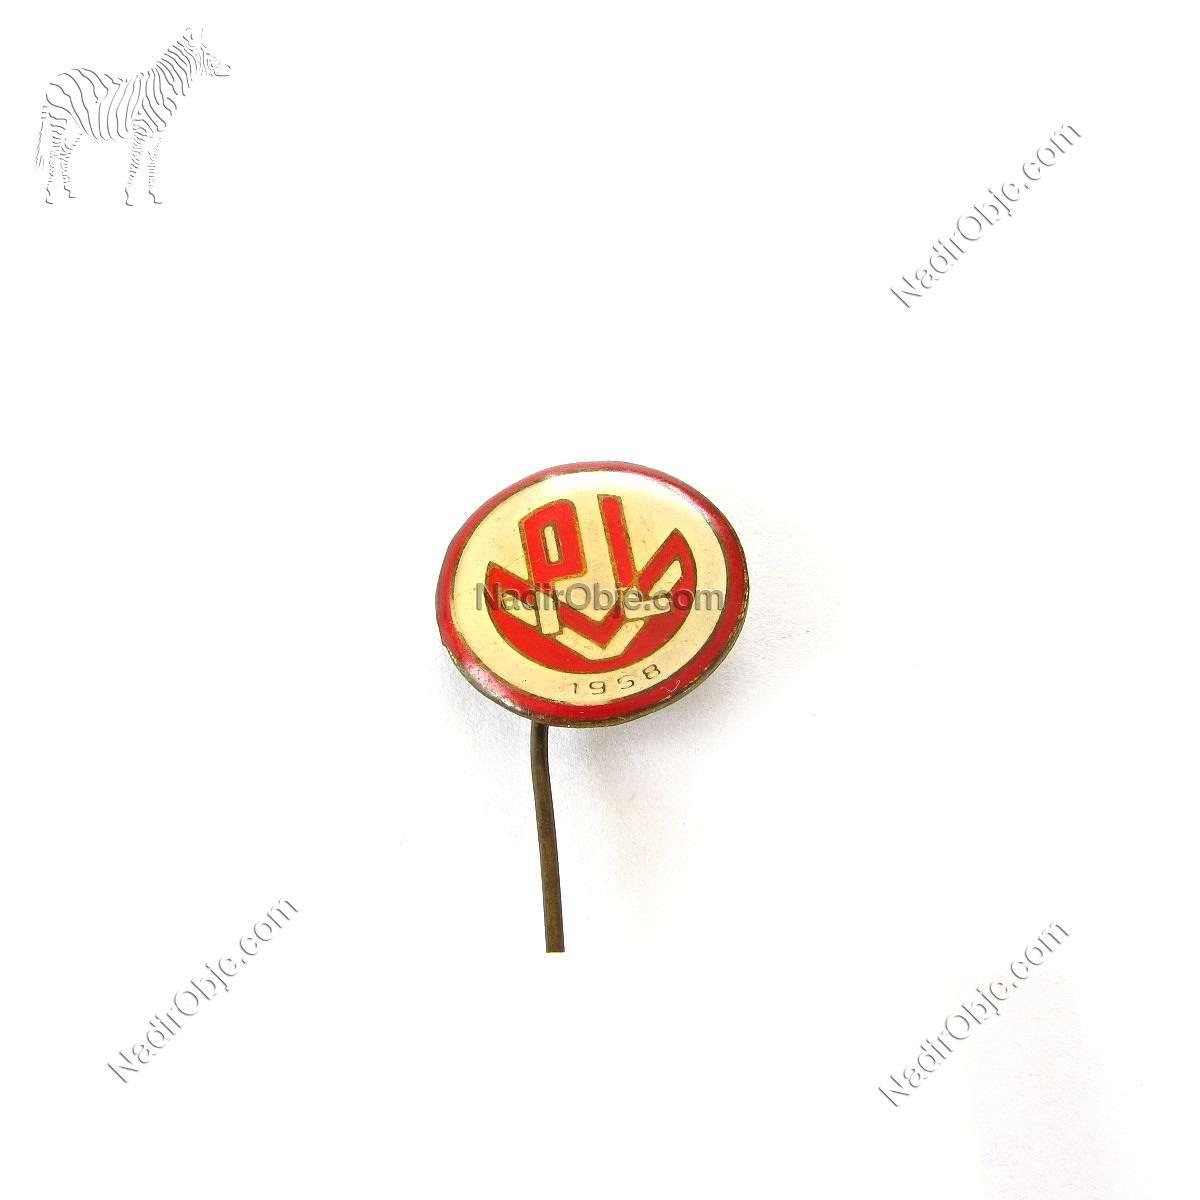 PL Rozet Metal Objeler Lapel Badge